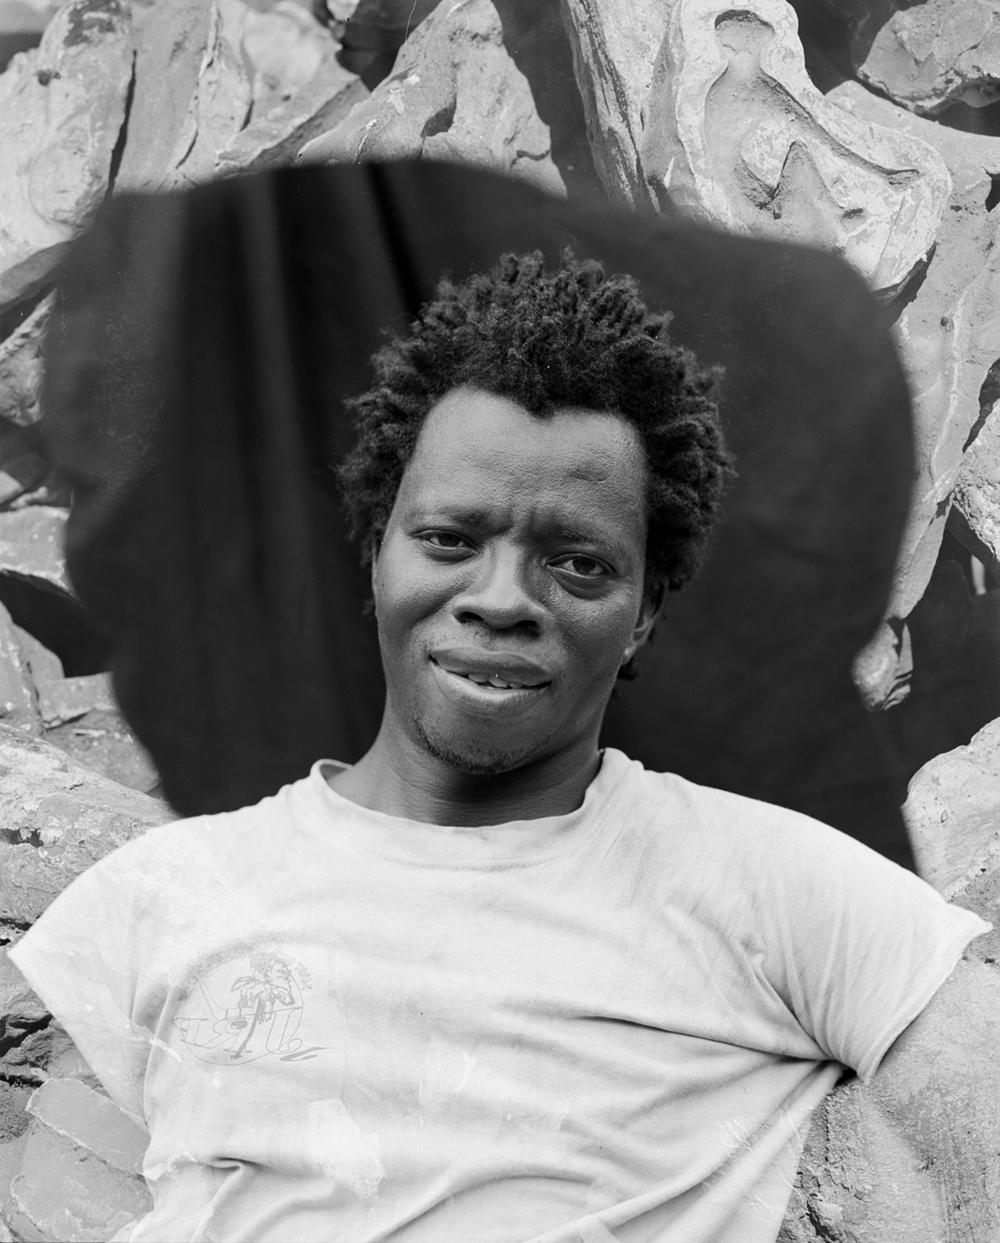 ALPHONSE OUEDRAOGO Bronze caster, BURKINA FASO